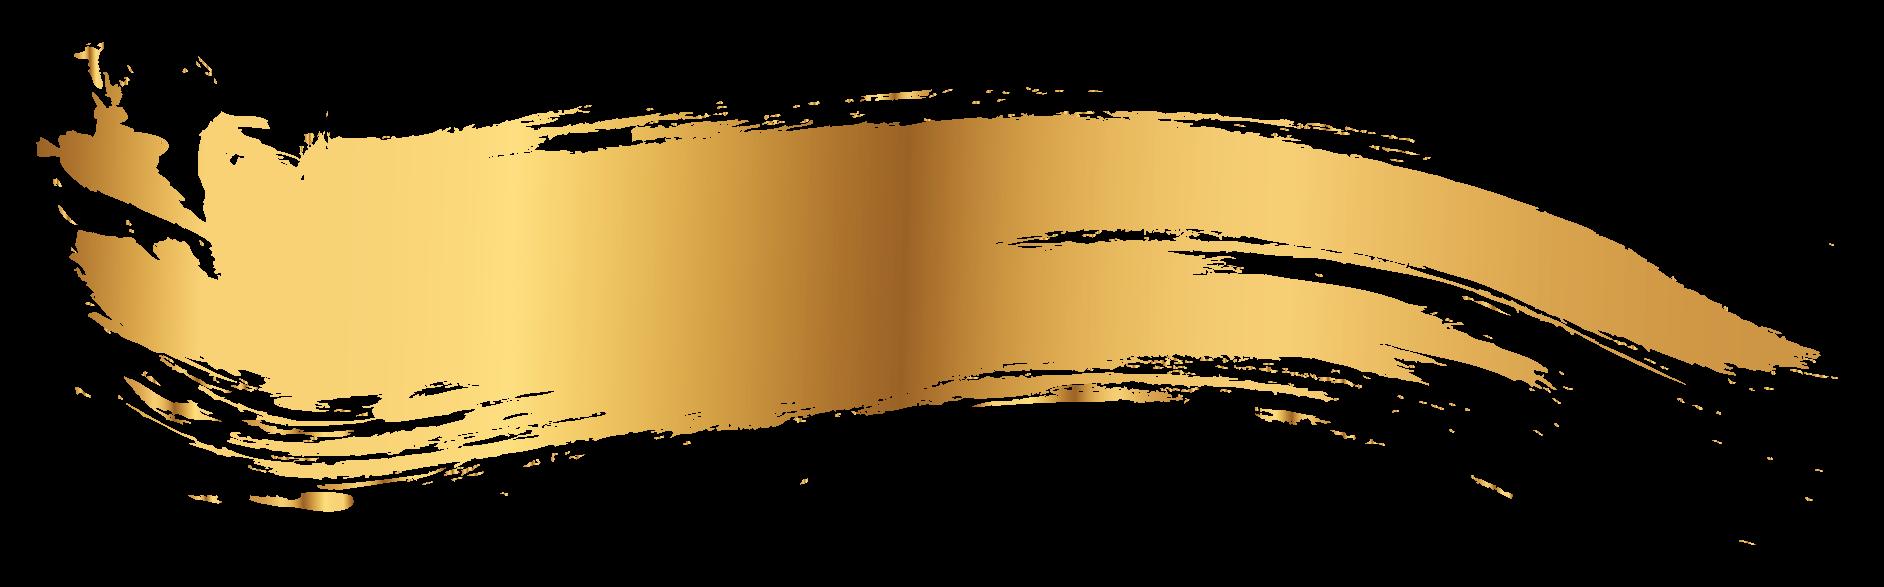 Banner-โปรโมท-วิหคชาดพิฆาตกล-2